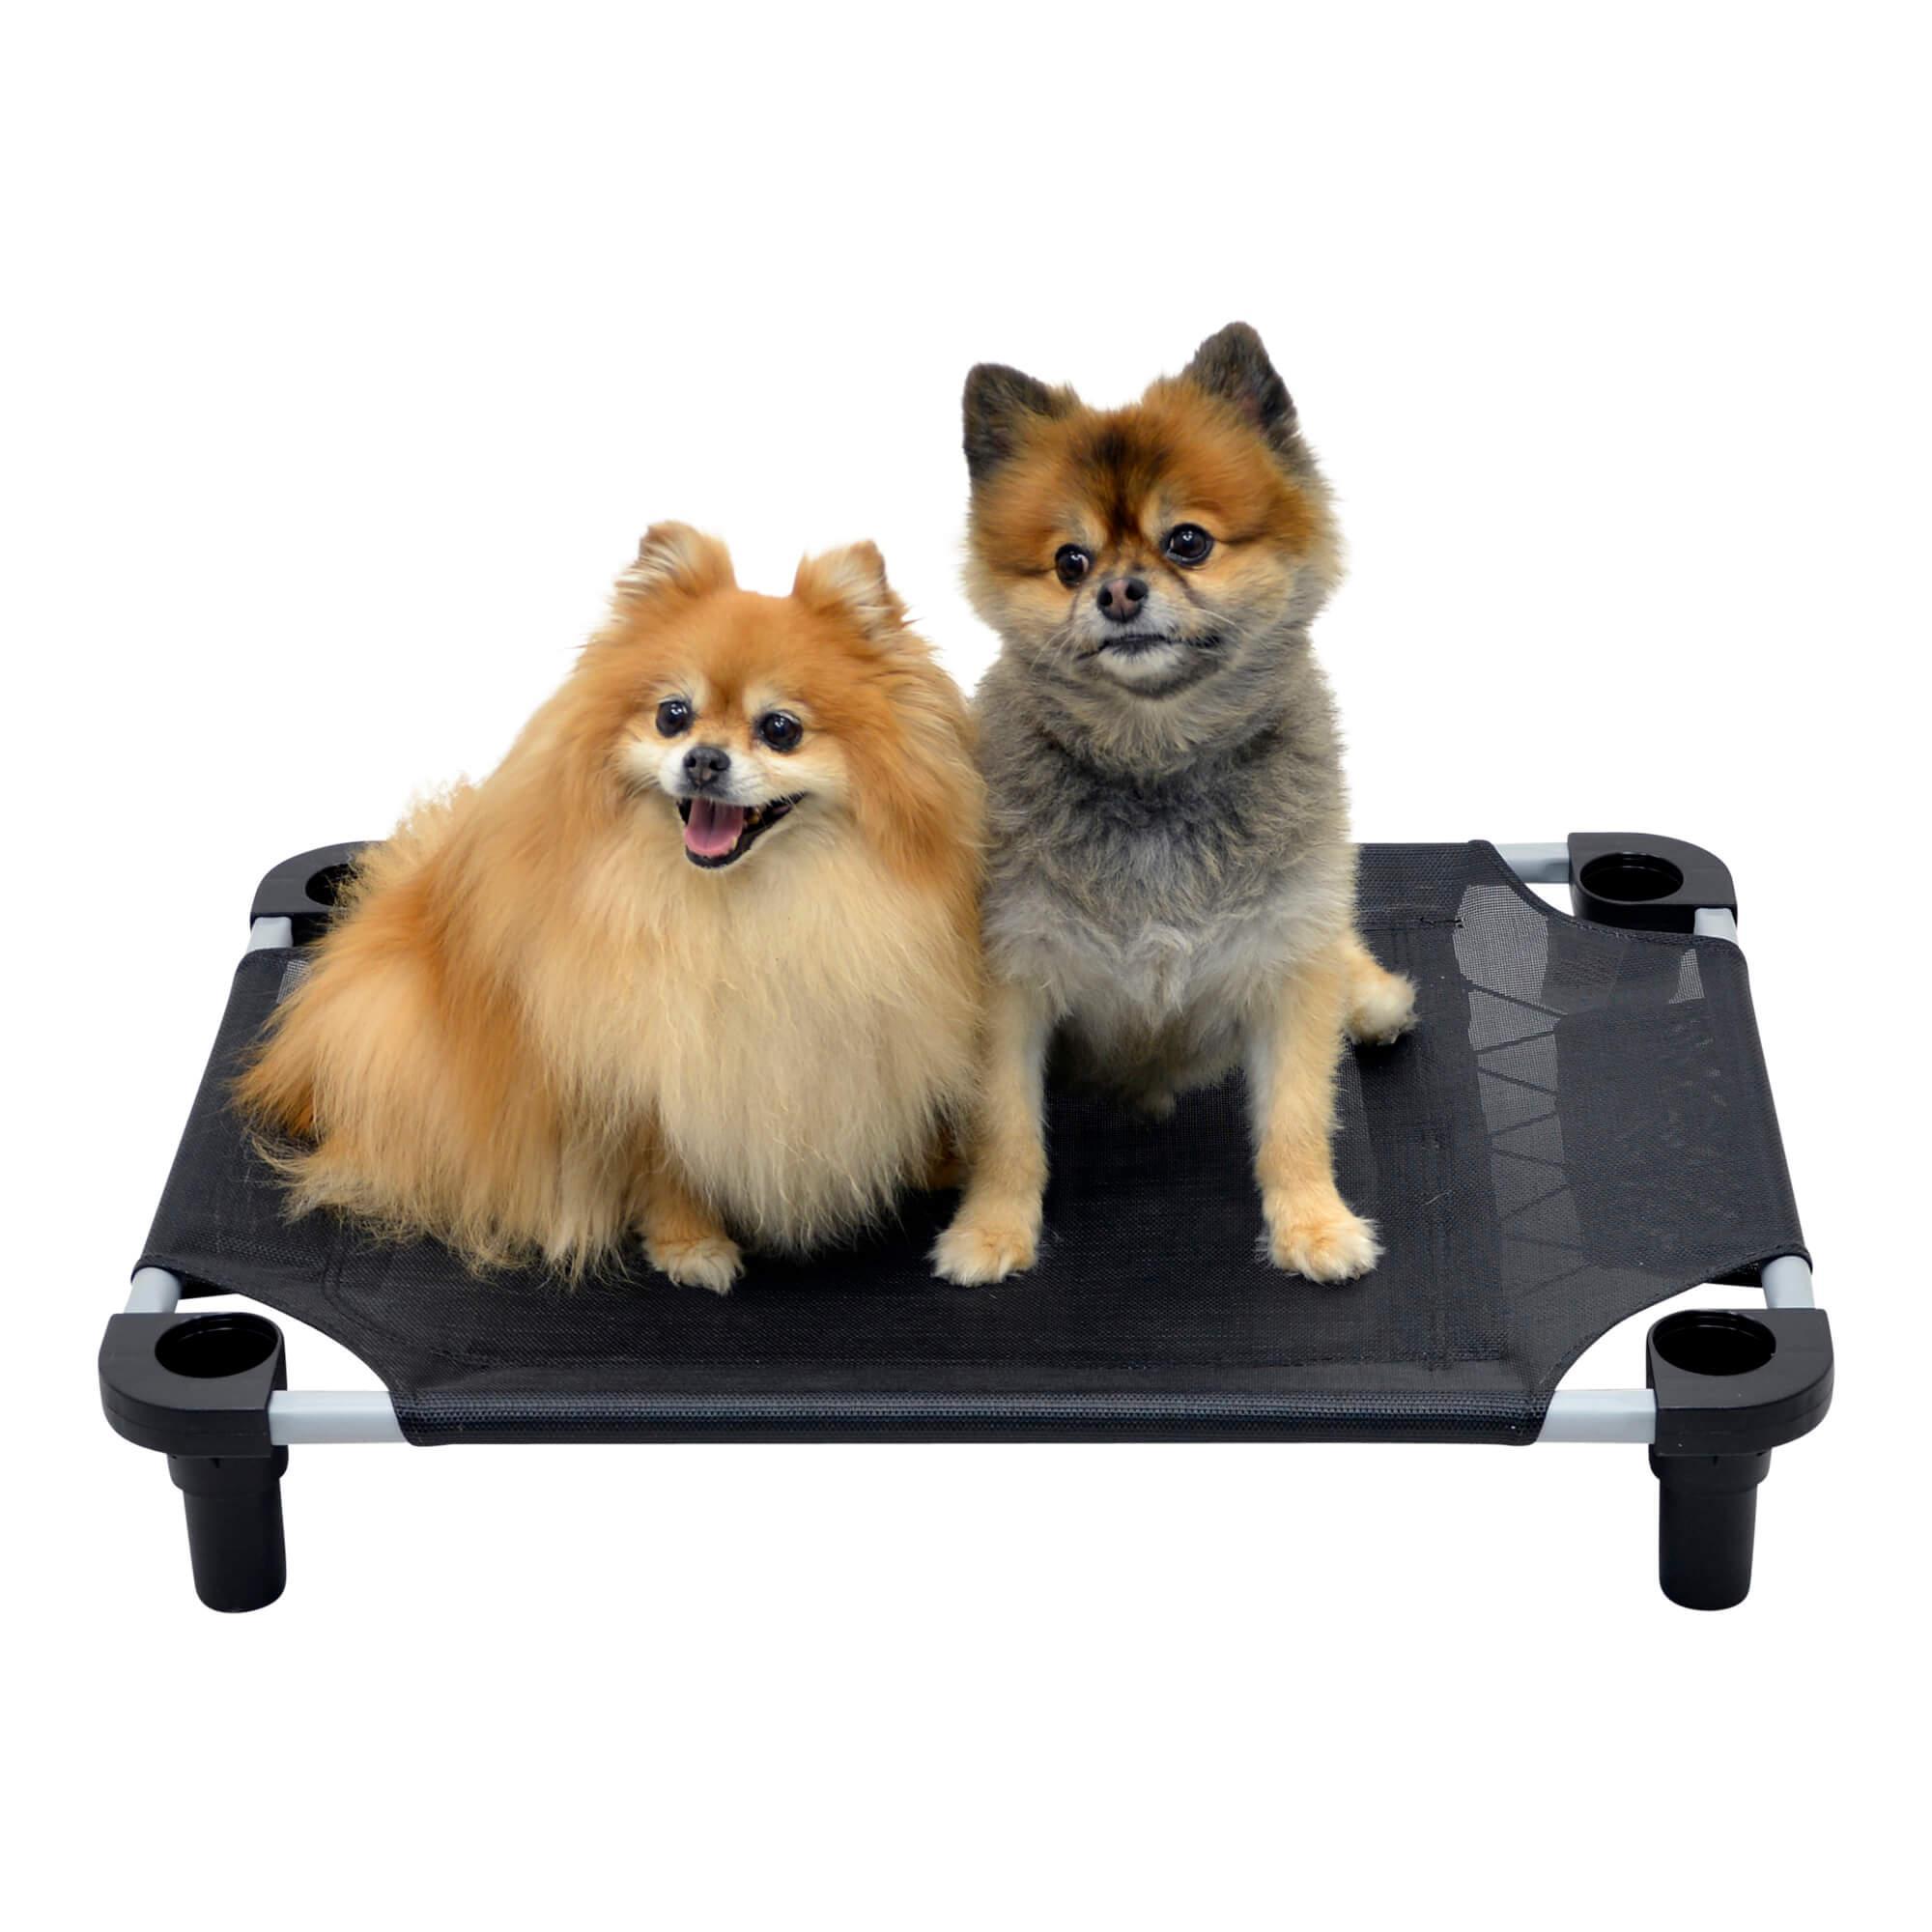 Solid Color Premium Weave Dog Cot - Black